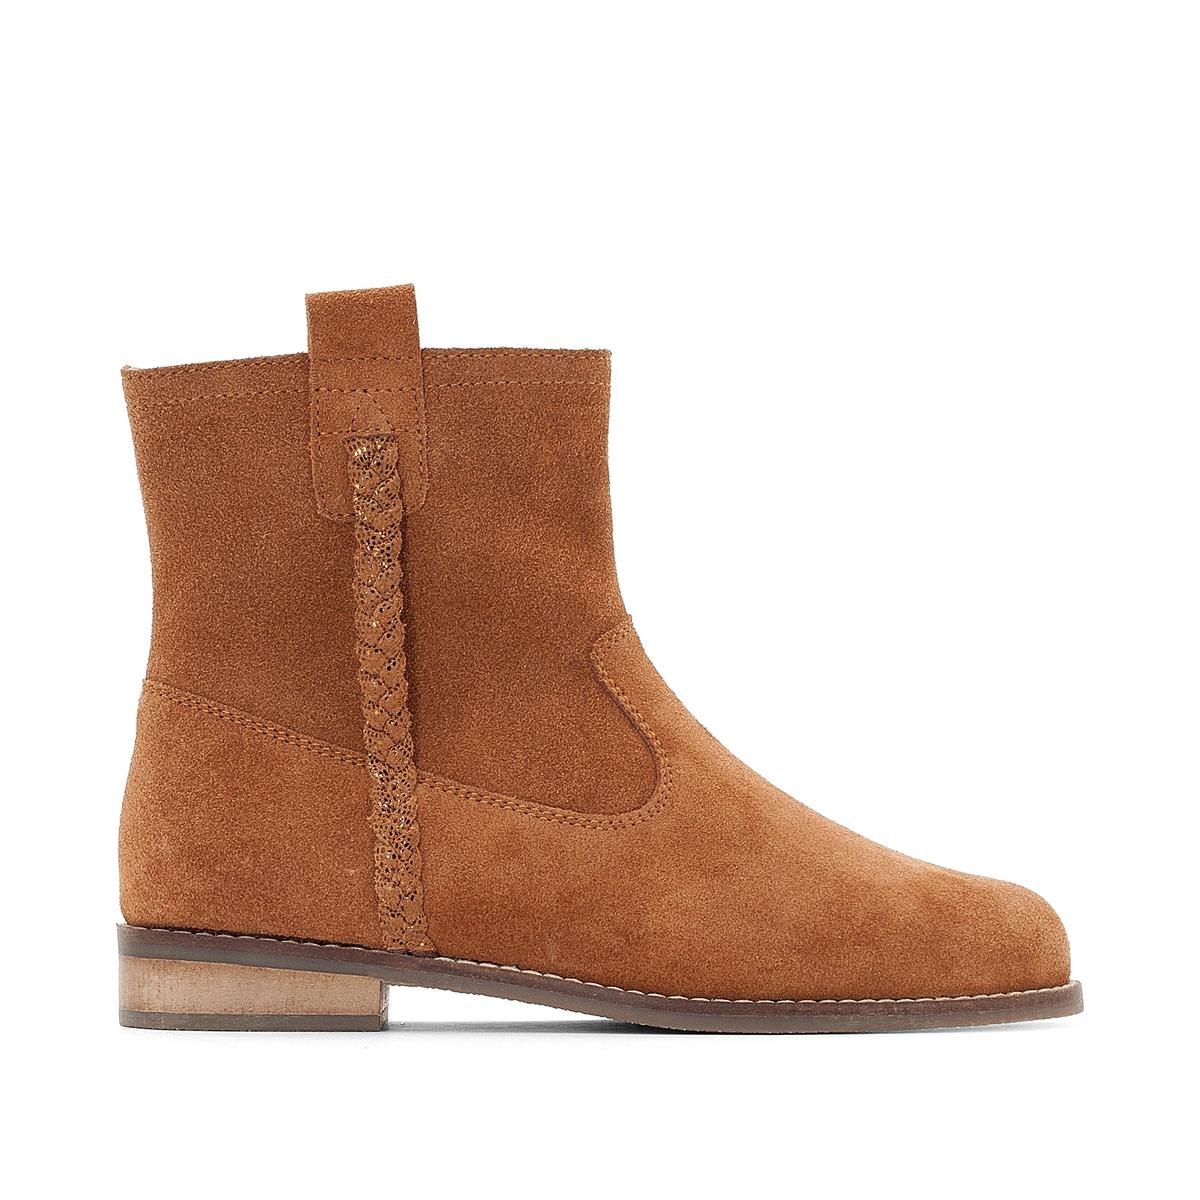 Boots cerniere in pelle 26-39